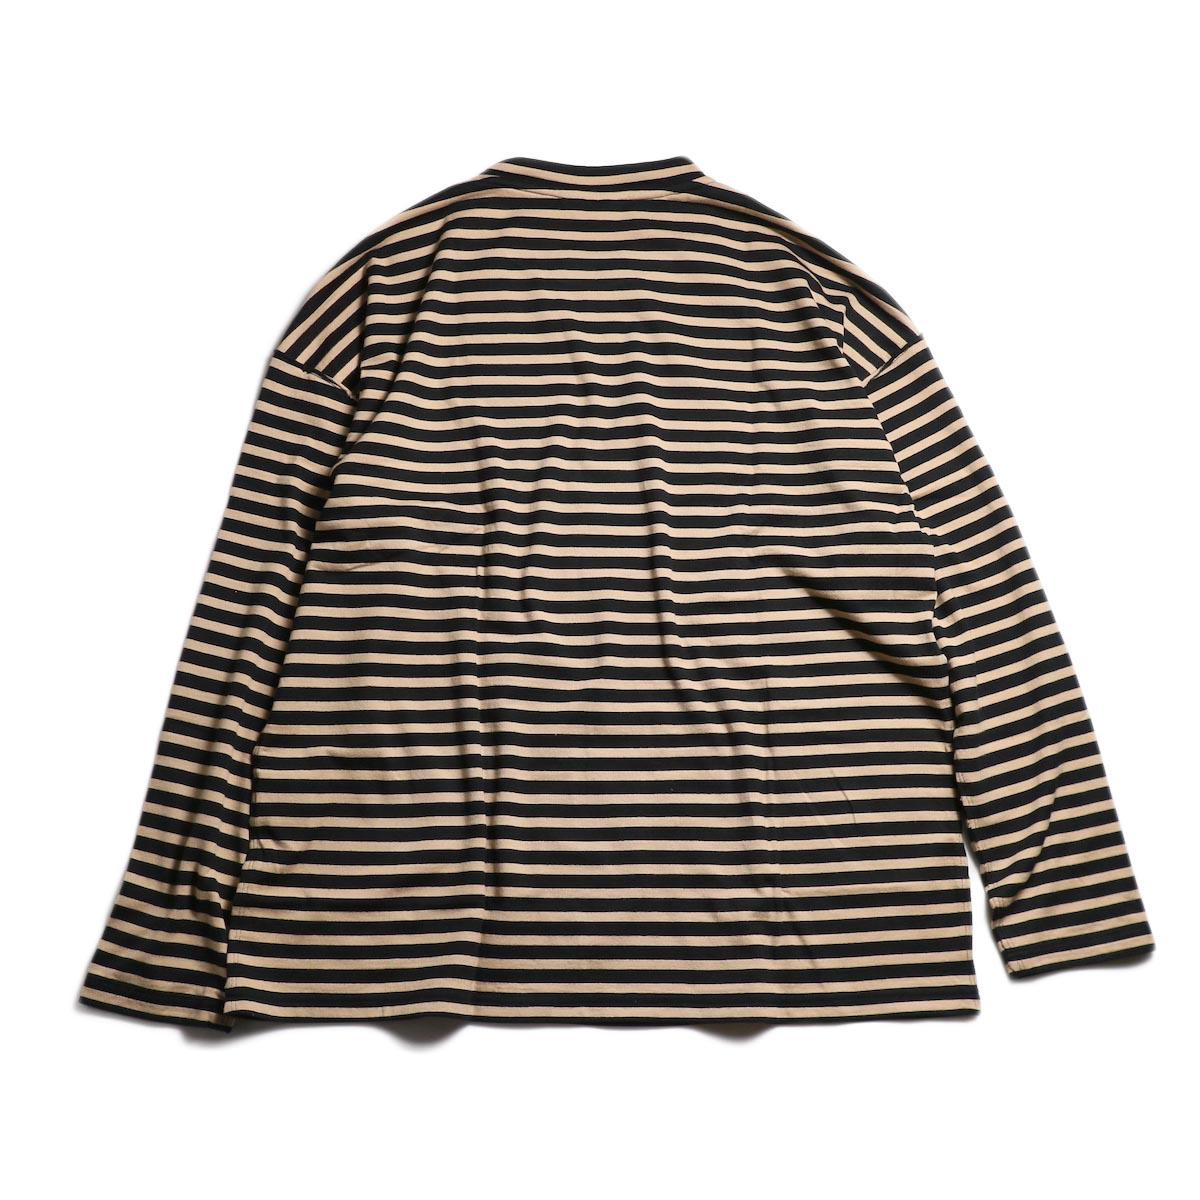 UNUSED / US1682 Long Sleeve Border T-Shirt -Beige/Black 背面